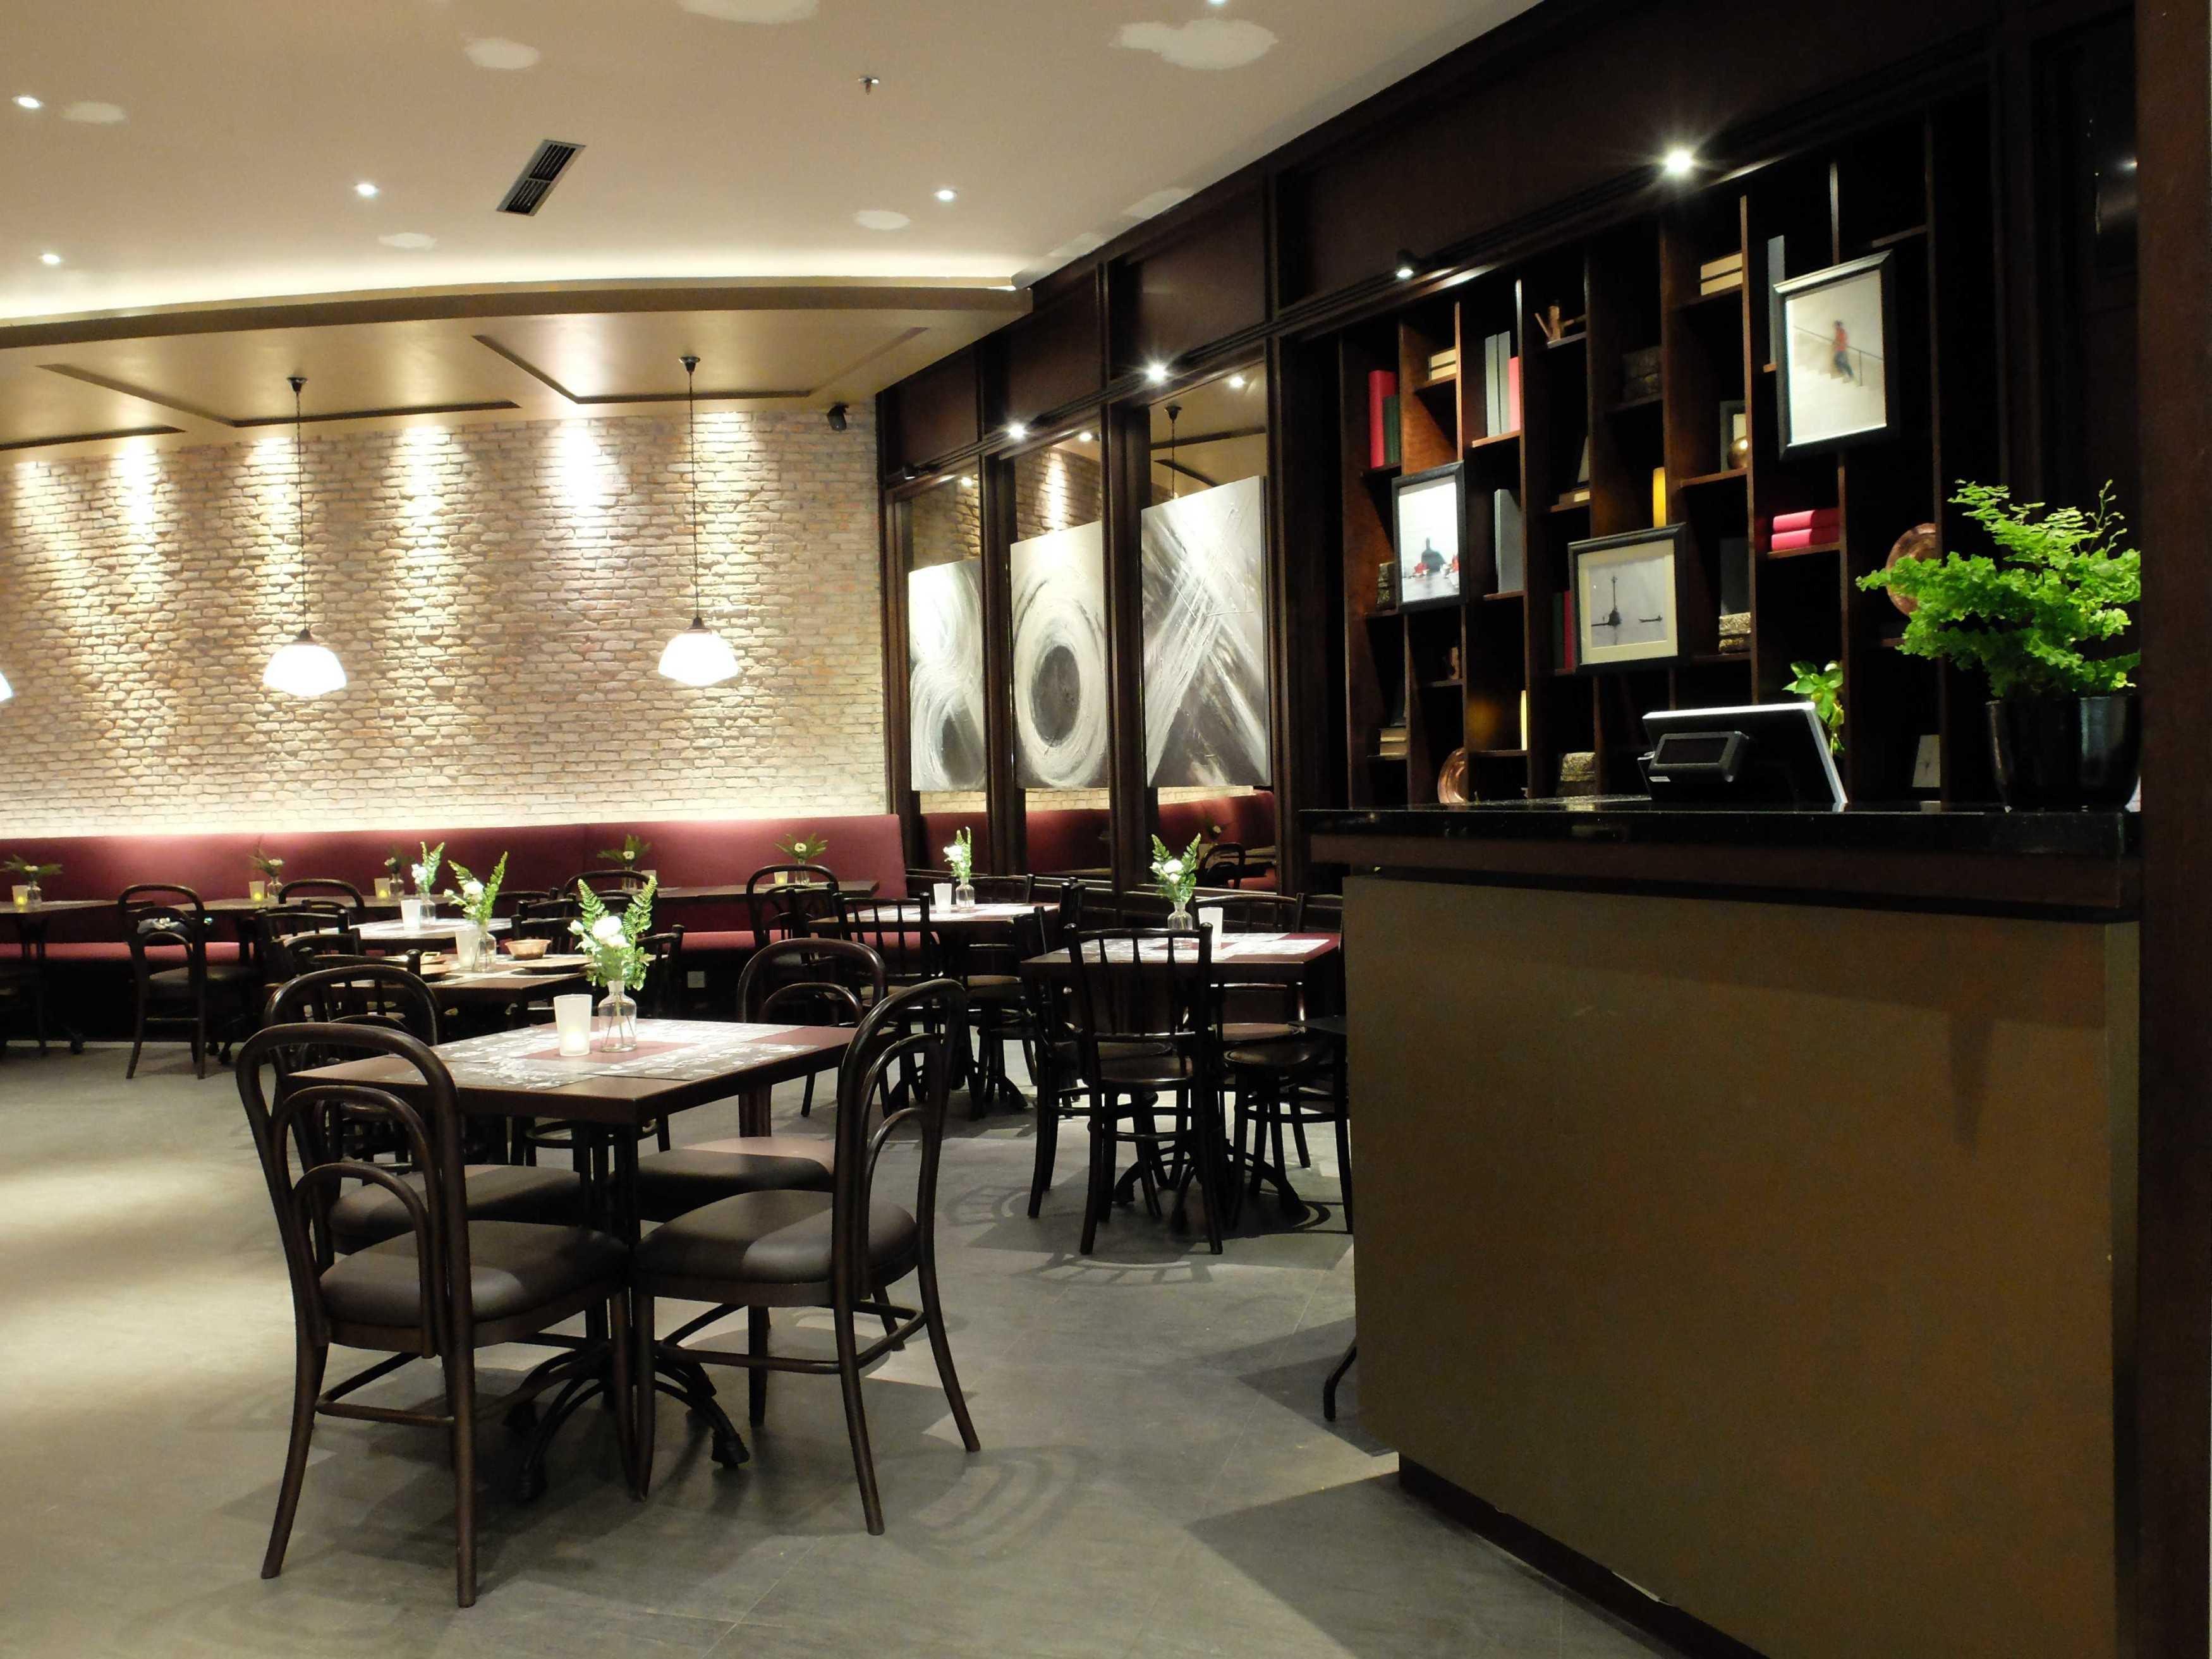 Pt. Modula Marco Padang Grill Lotte Shopping Avanue, Jakarta Lotte Shopping Avanue, Jakarta Dining Area Modern  26960